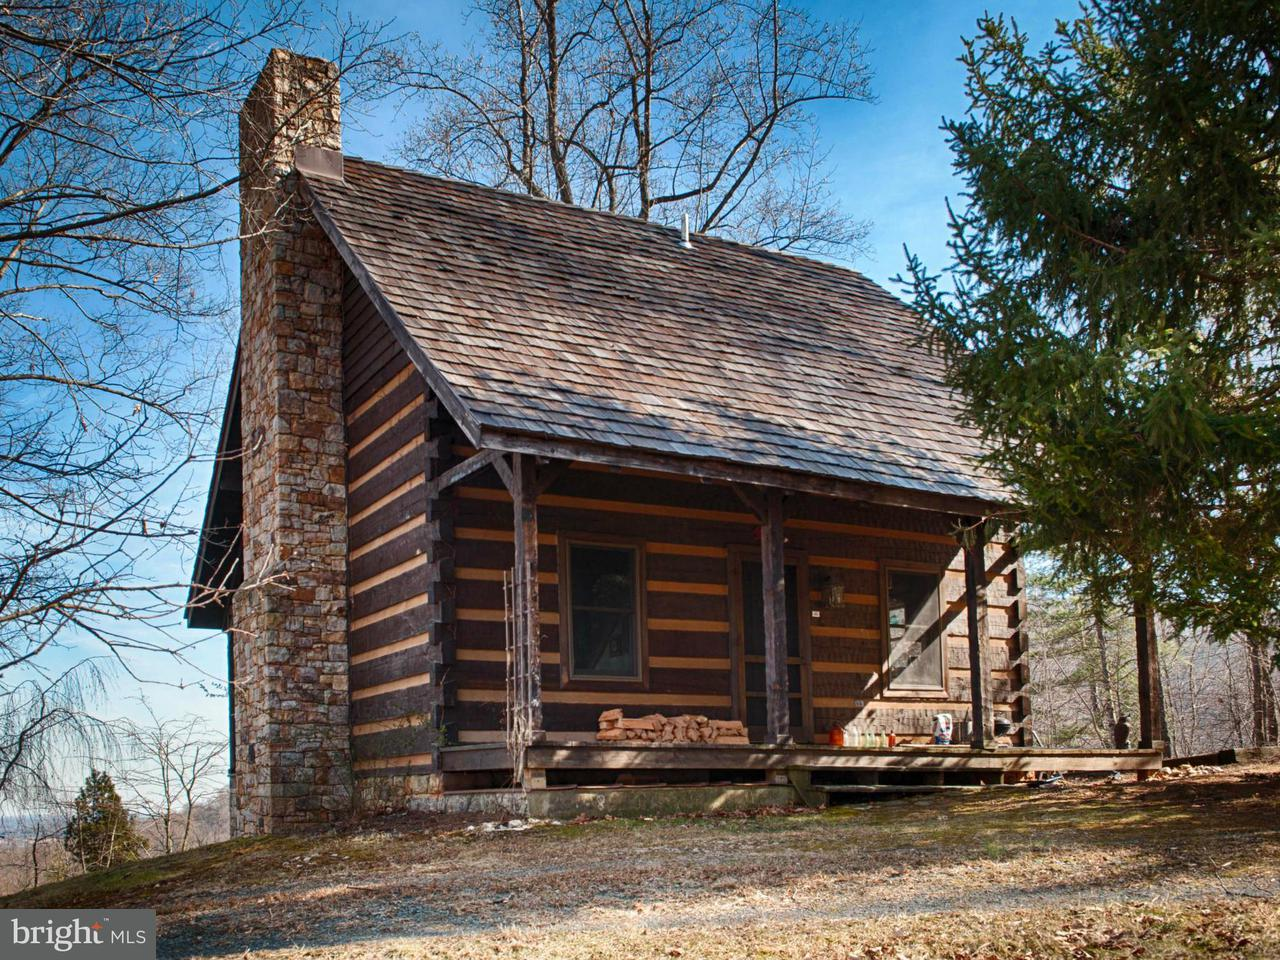 独户住宅 为 销售 在 509 Bessie Bell Mtn Road 509 Bessie Bell Mtn Road Woodville, 弗吉尼亚州 22749 美国